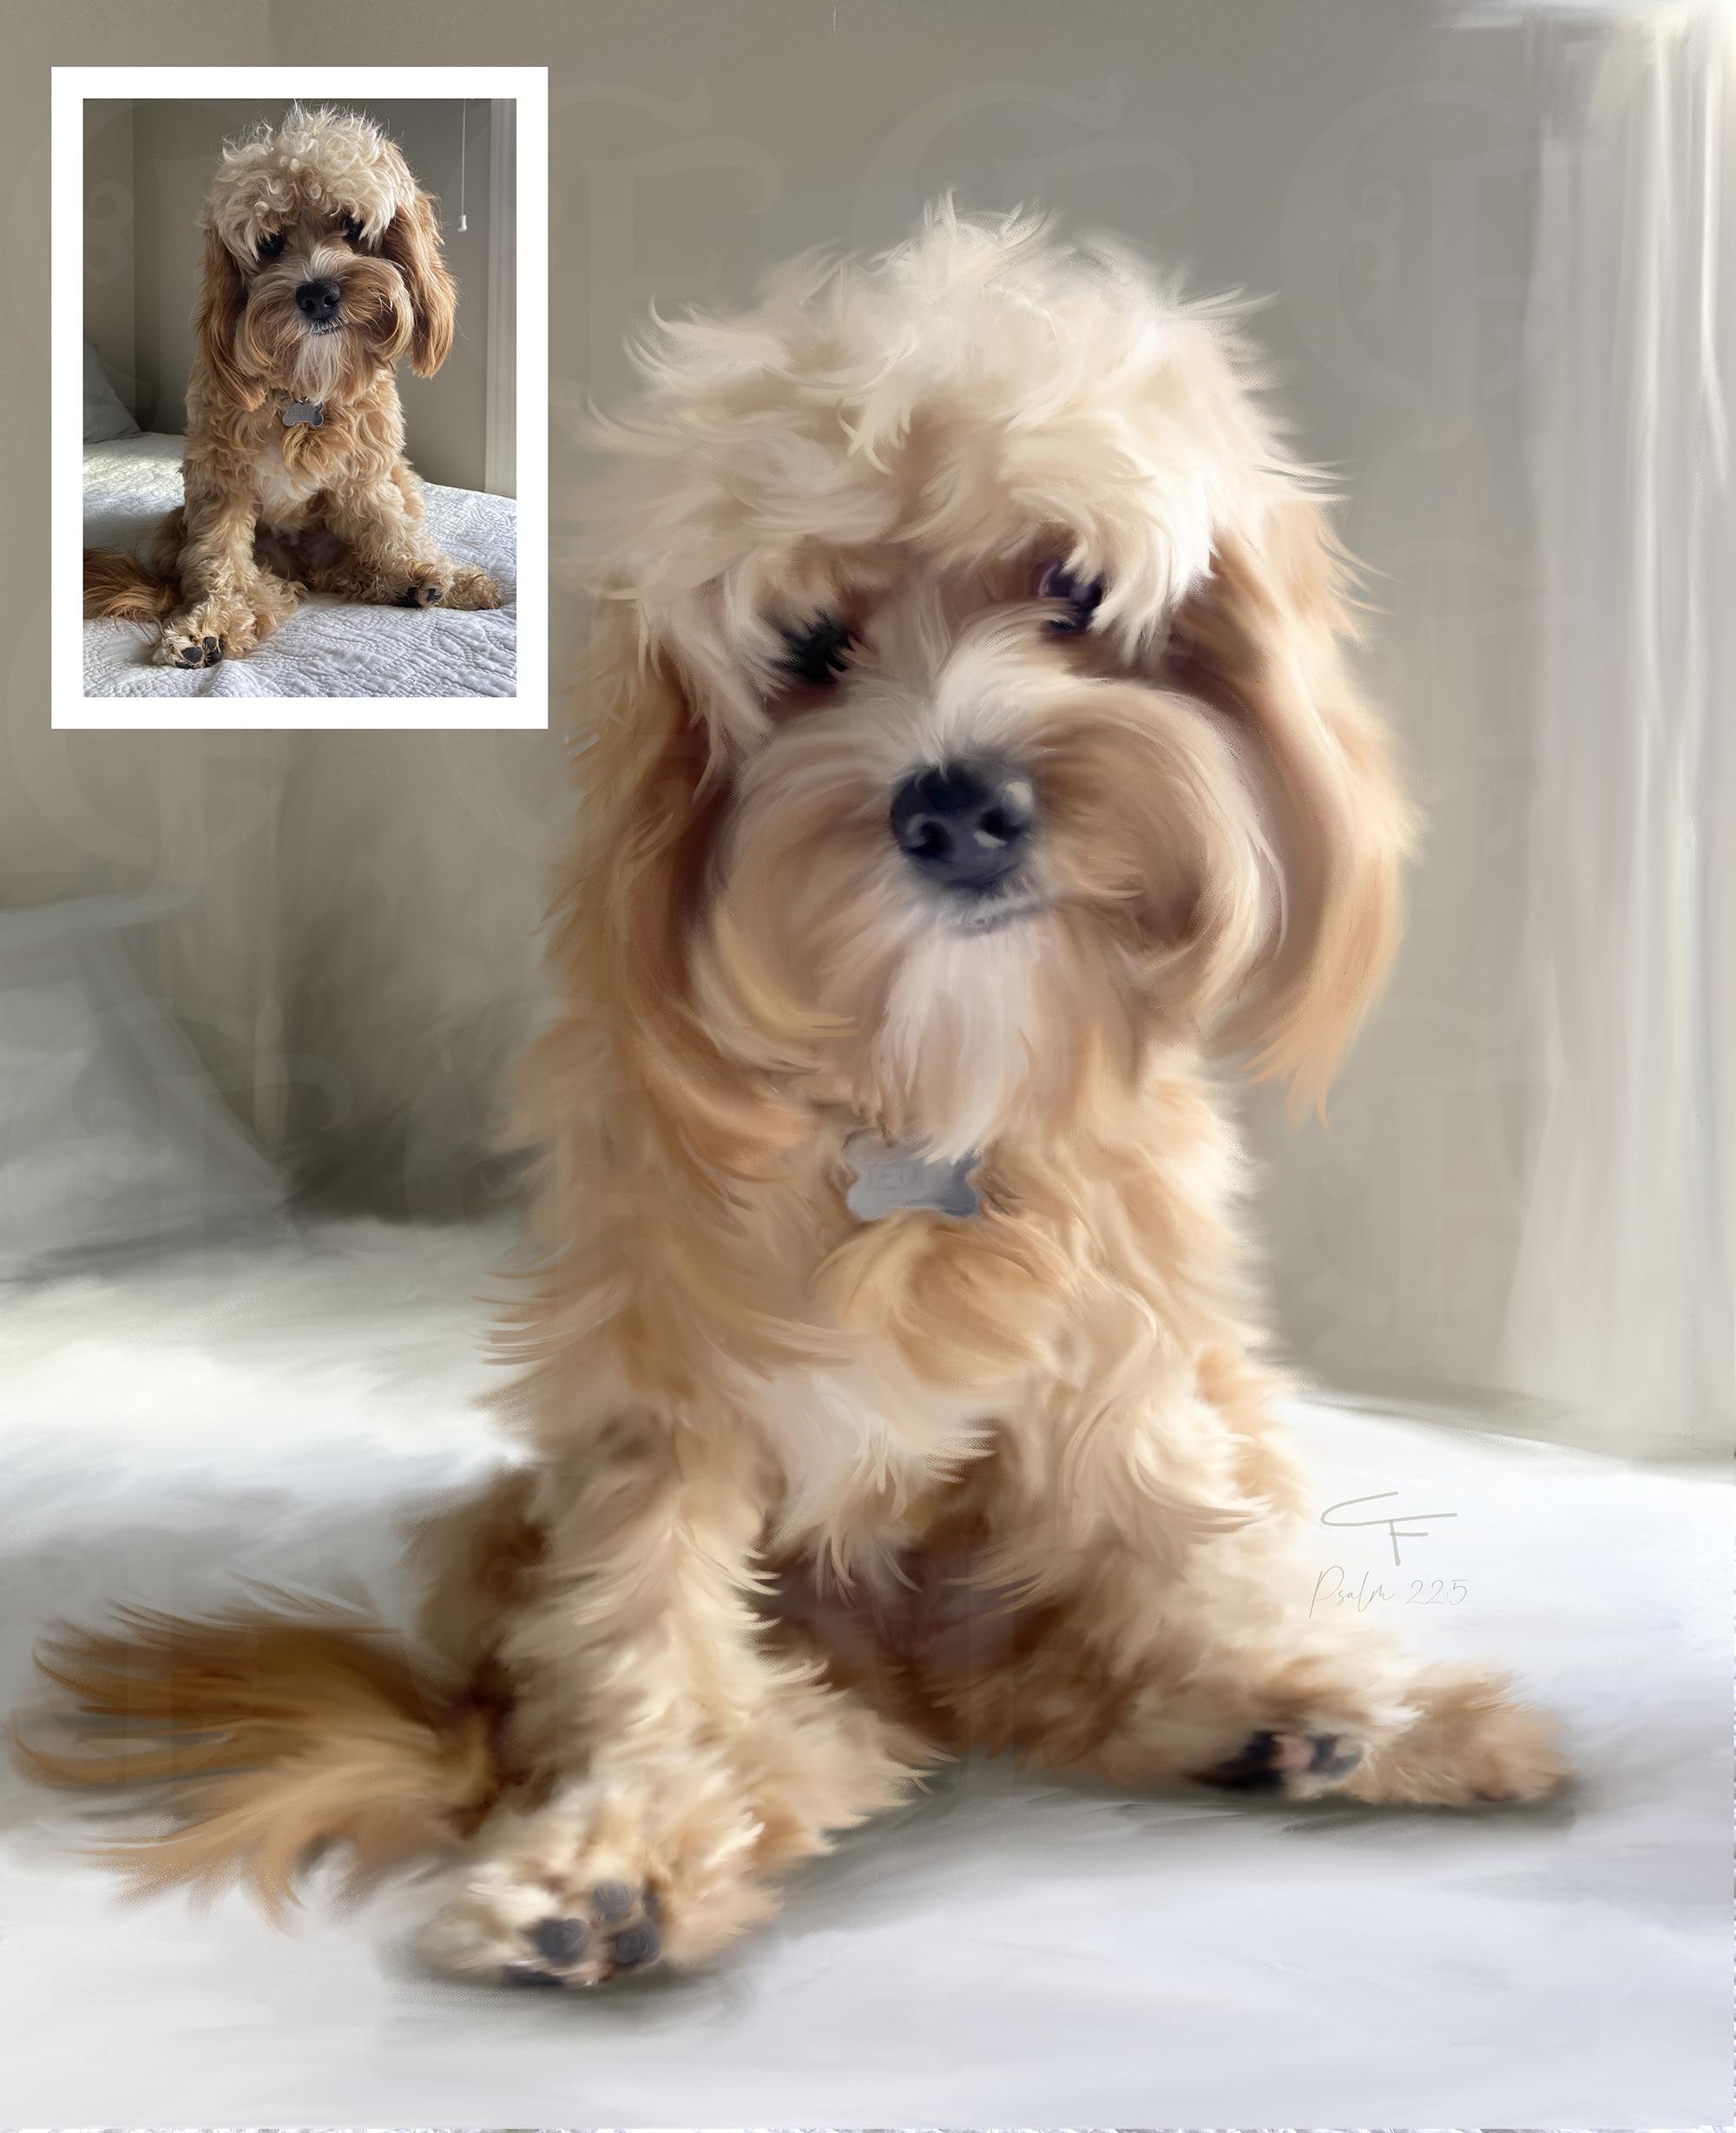 Birmingham Alabama Pet Dog Painted Portrait Artist from Photo on Stretched Canvas by Carol Ferguson Art